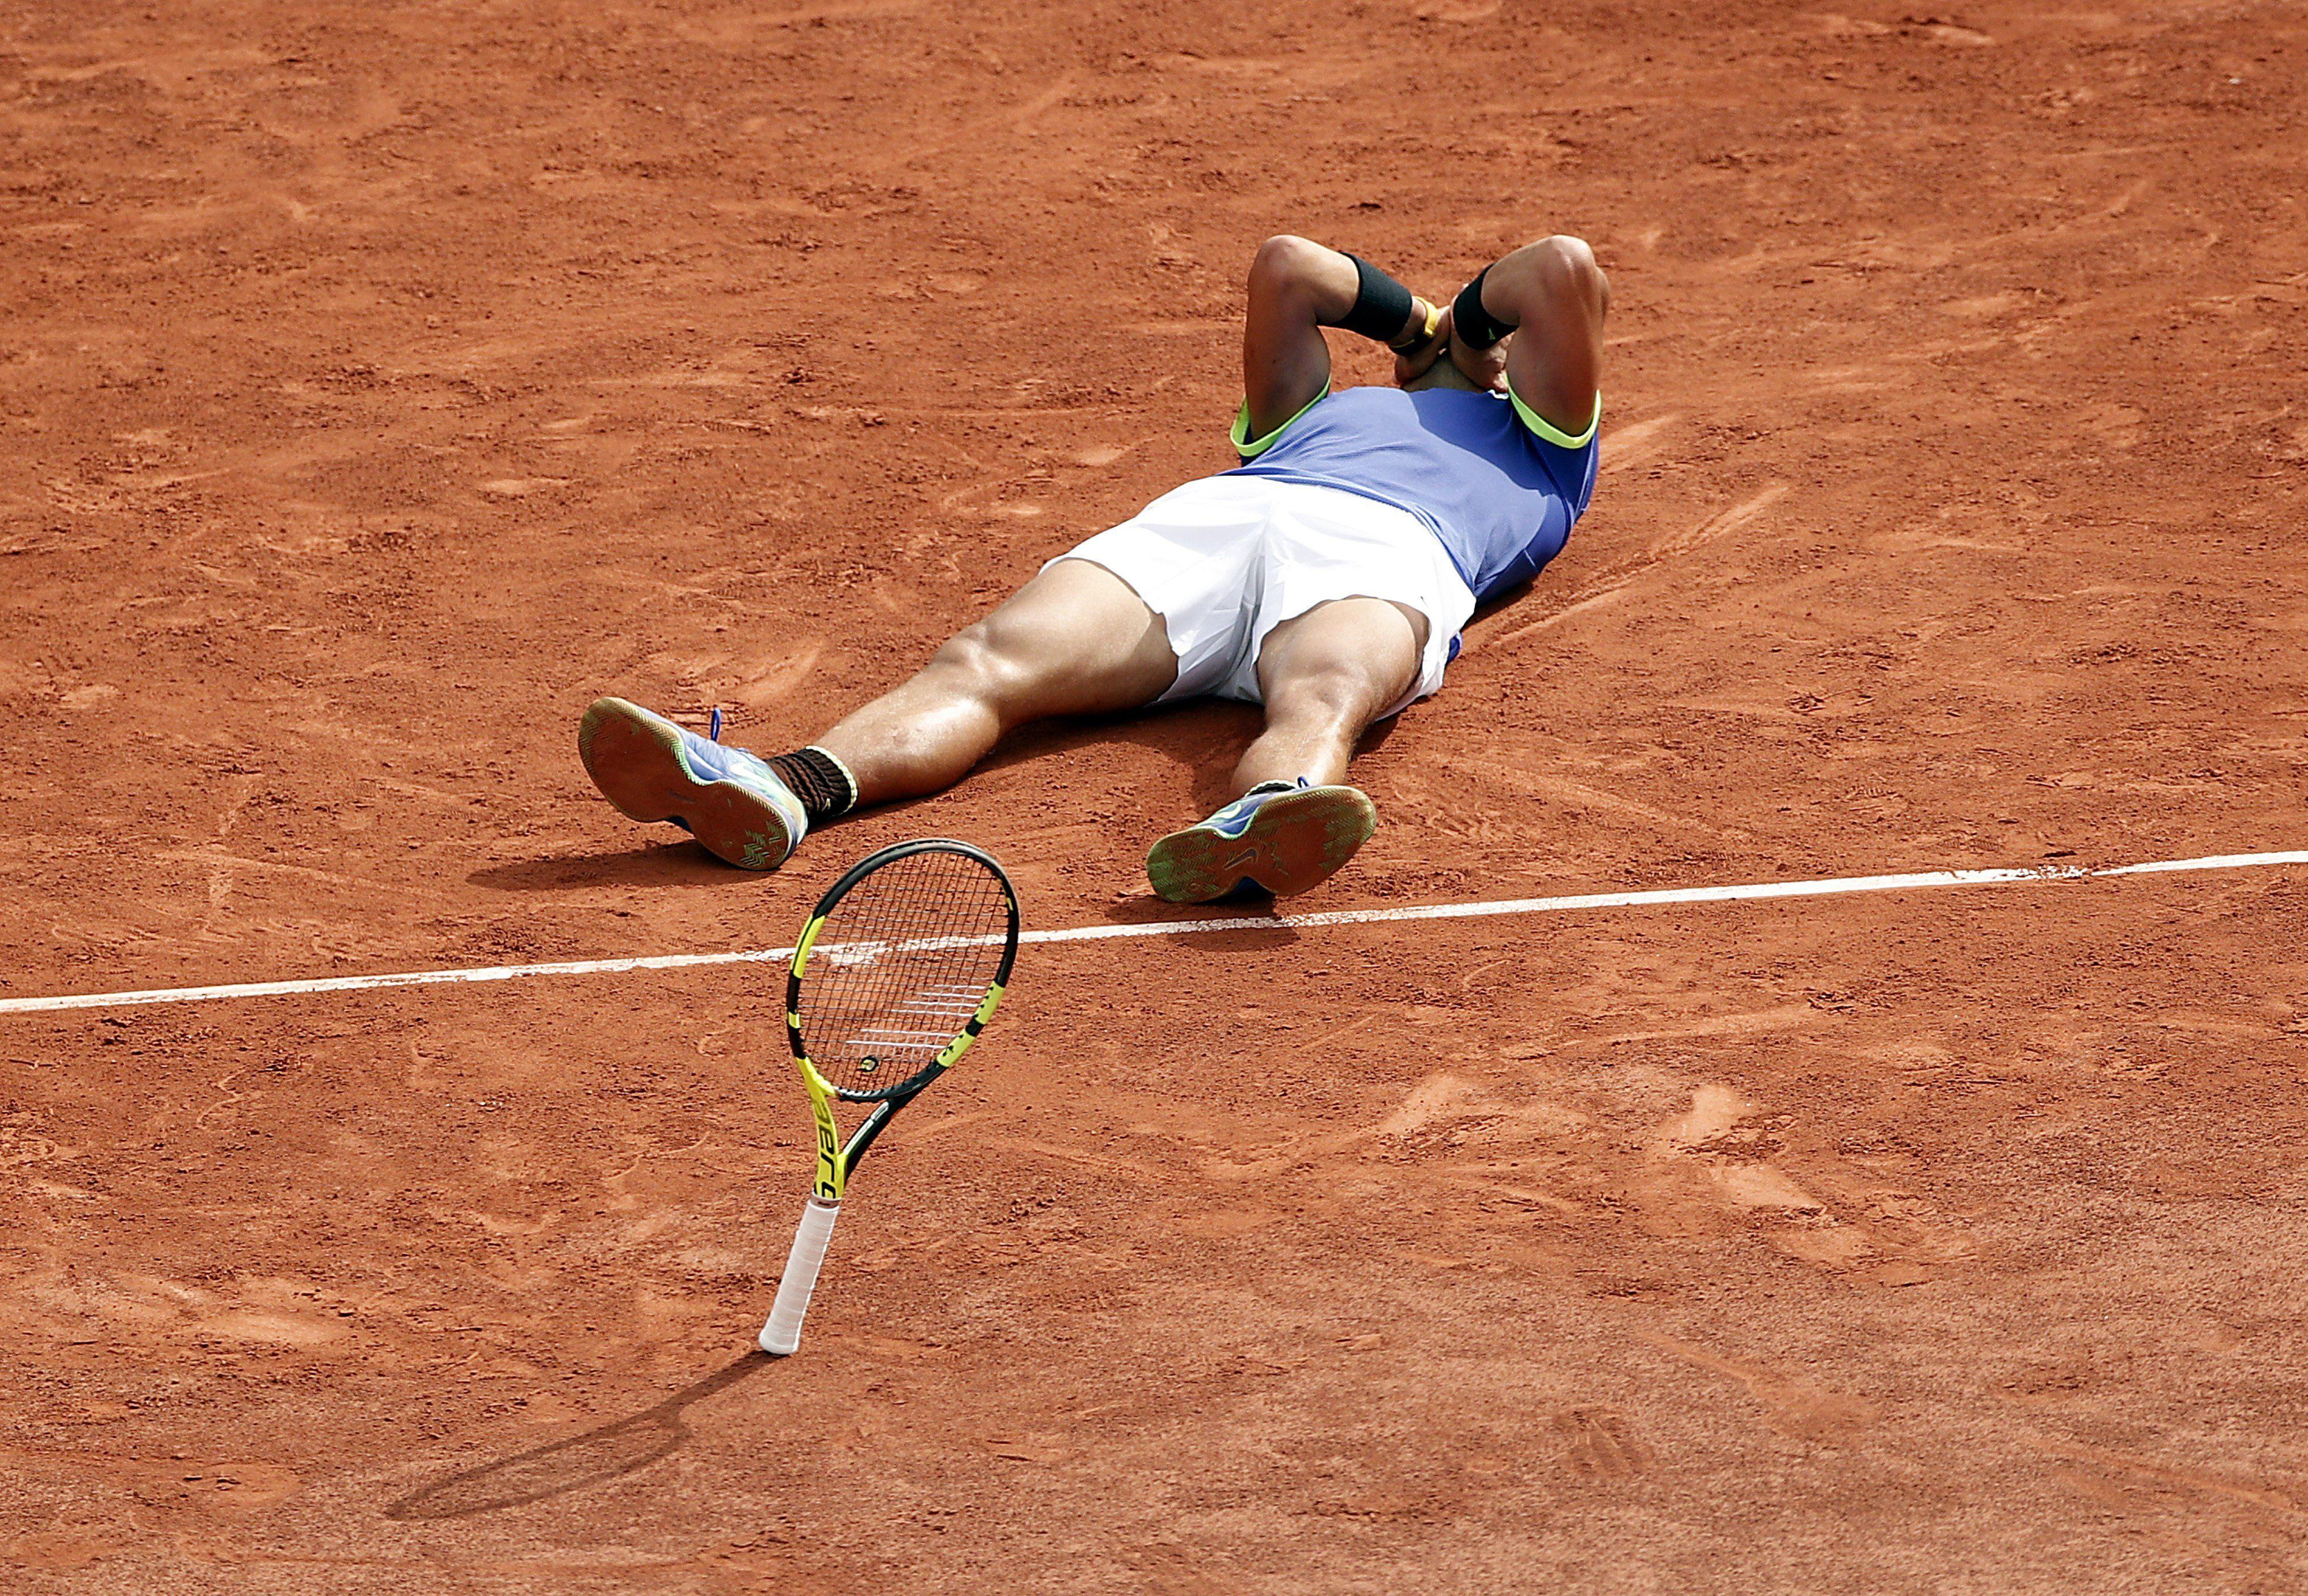 Rey absoluto: Nadal aplastó a Wawrinka y ganó su 10° Roland Garros